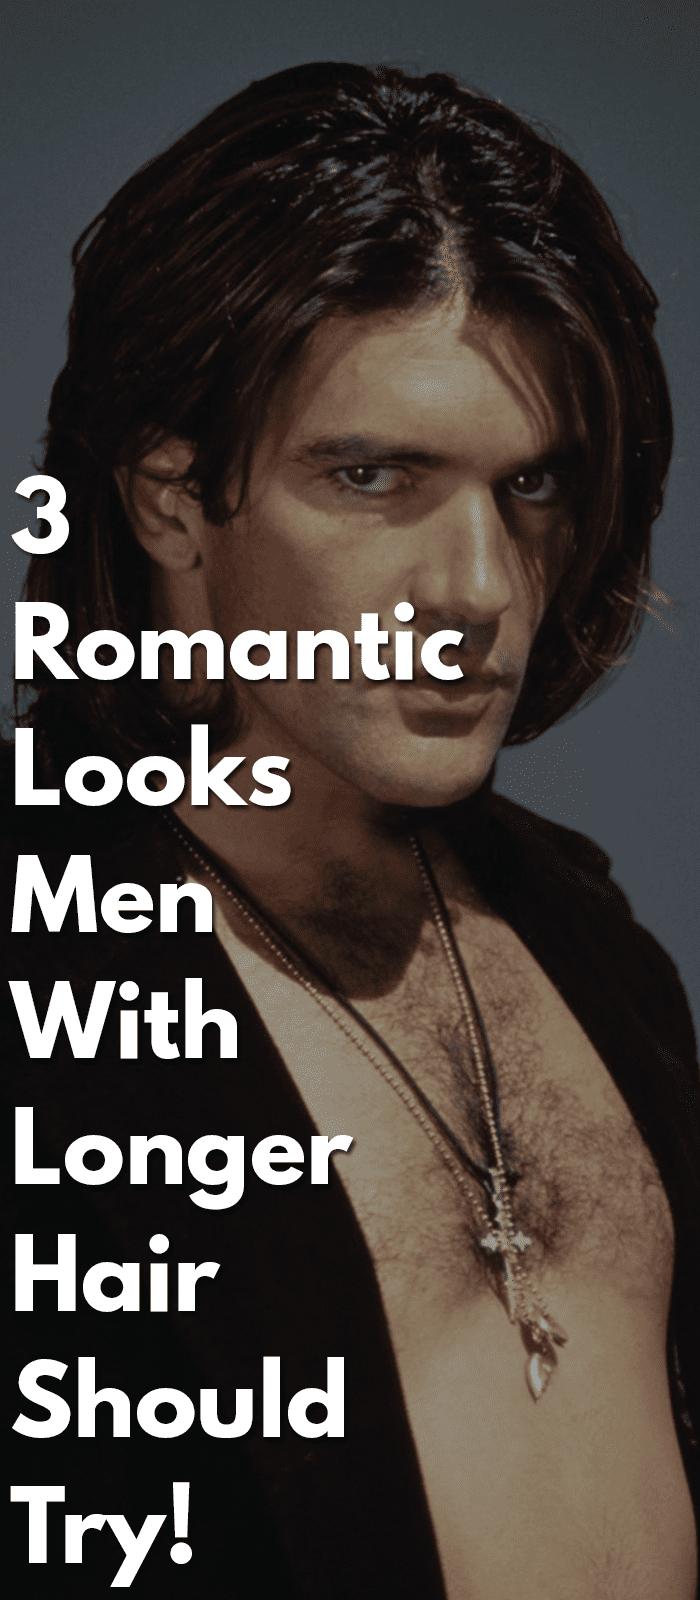 3-Romantic-Looks-Men-With-Longer-Hair-Should-Try!